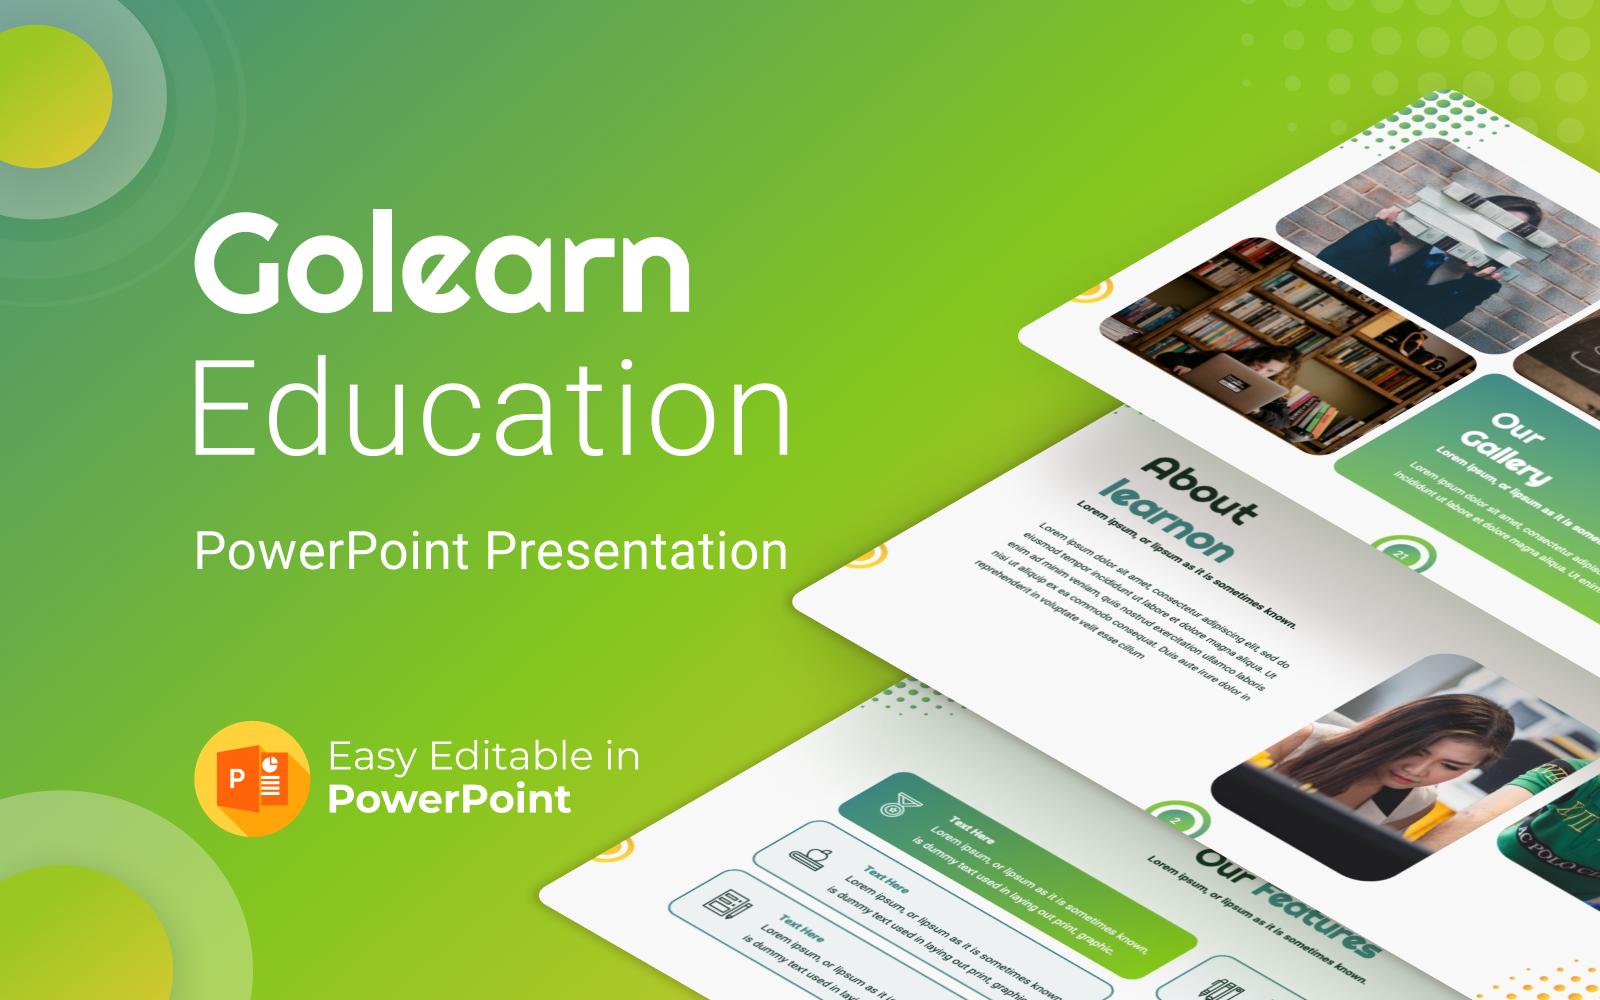 Golearn Education PowerPoint Presentation Template